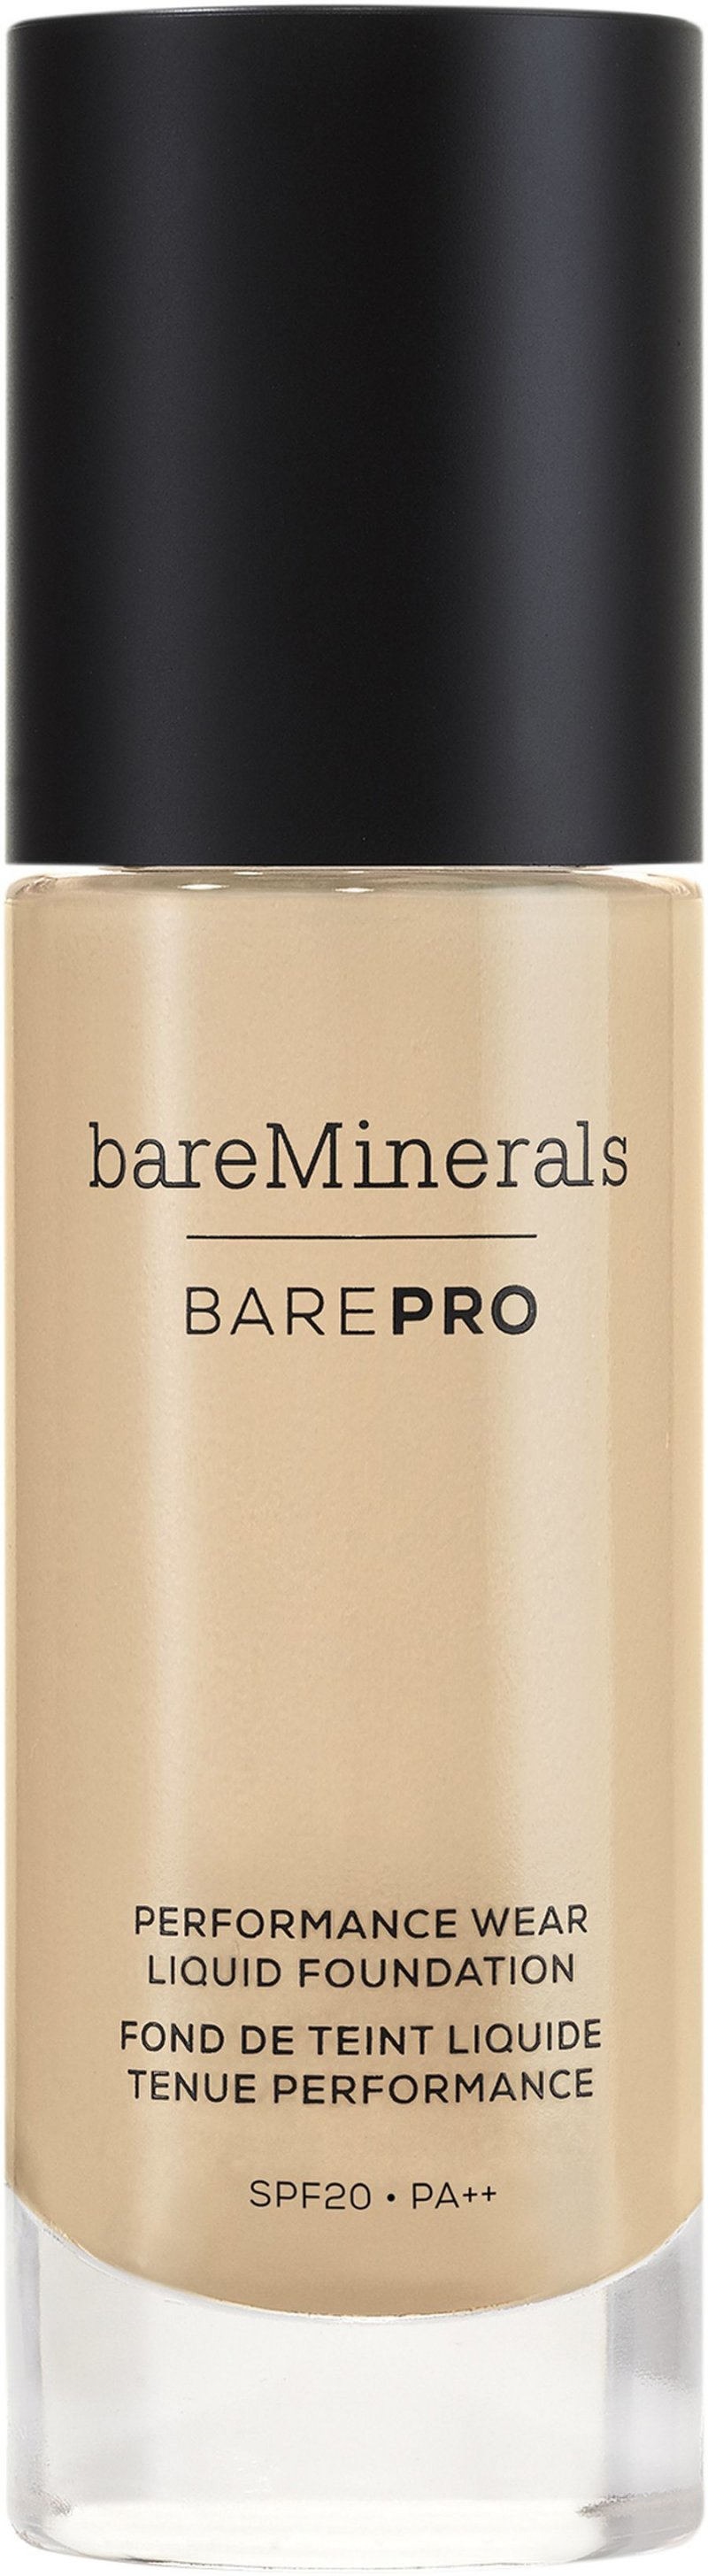 Image of   Bareminerals Foundation - Barepro Performance Wear Liquid - Cool Beige 10